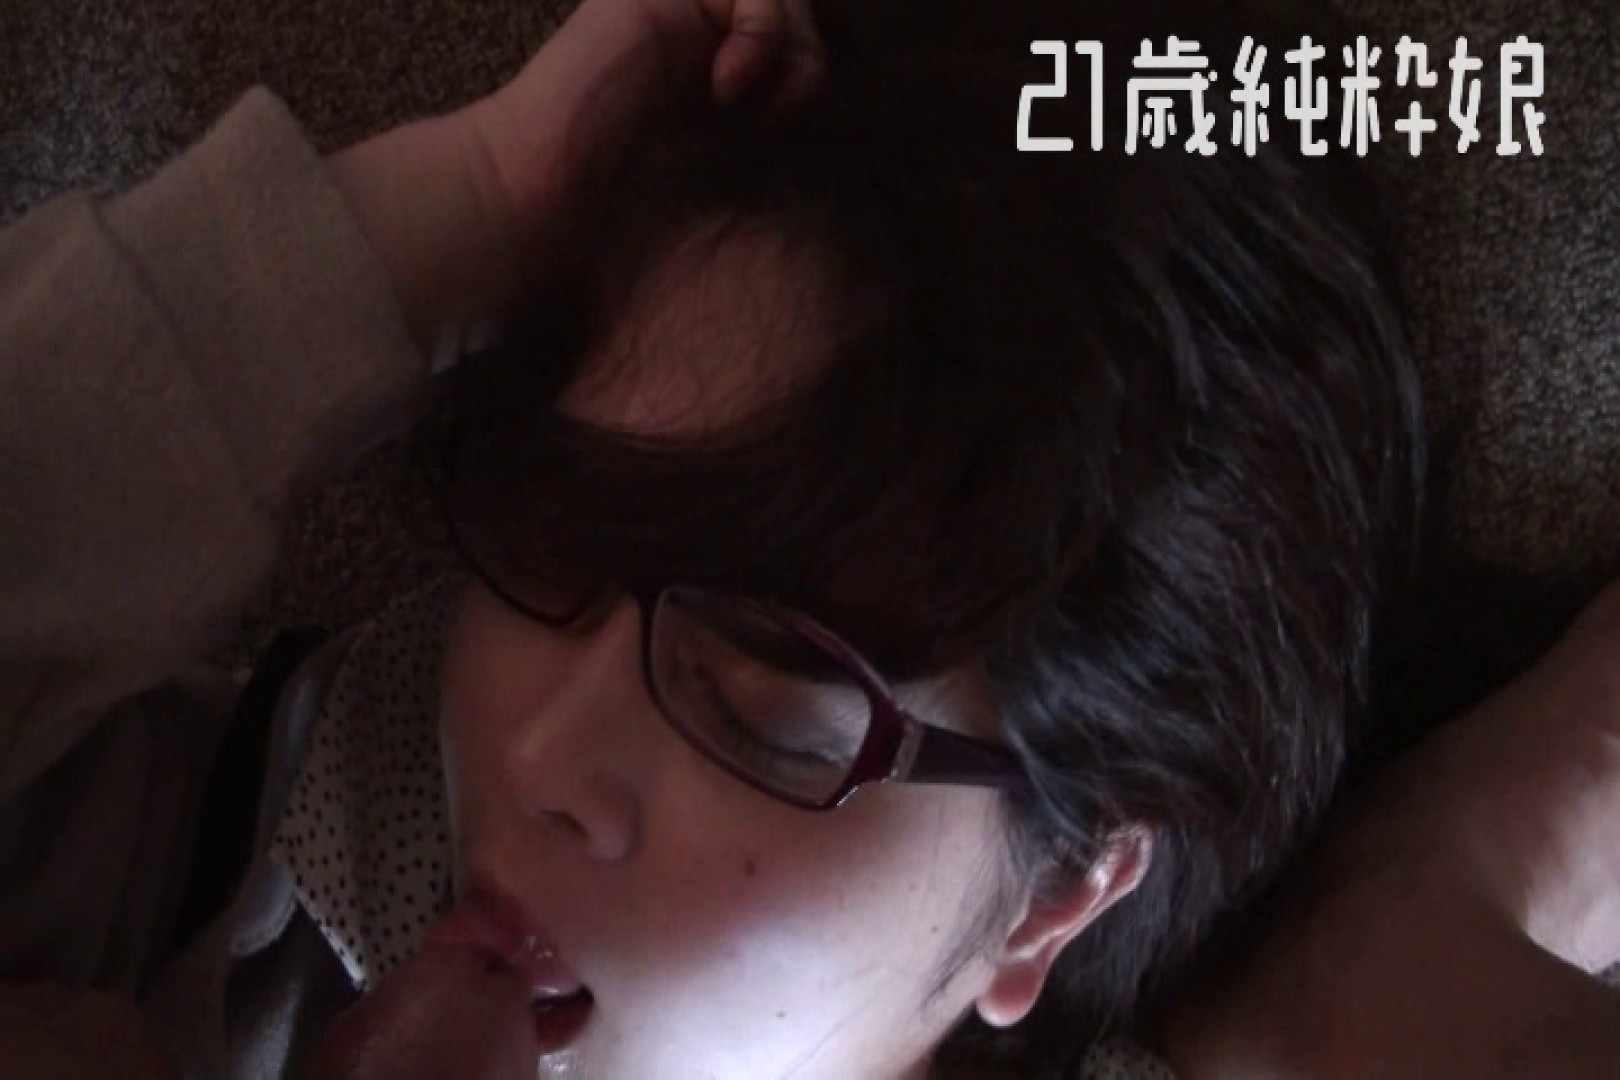 Gカップ21歳純粋嬢第2弾Vol.3 一般投稿 オマンコ動画キャプチャ 50pic 50